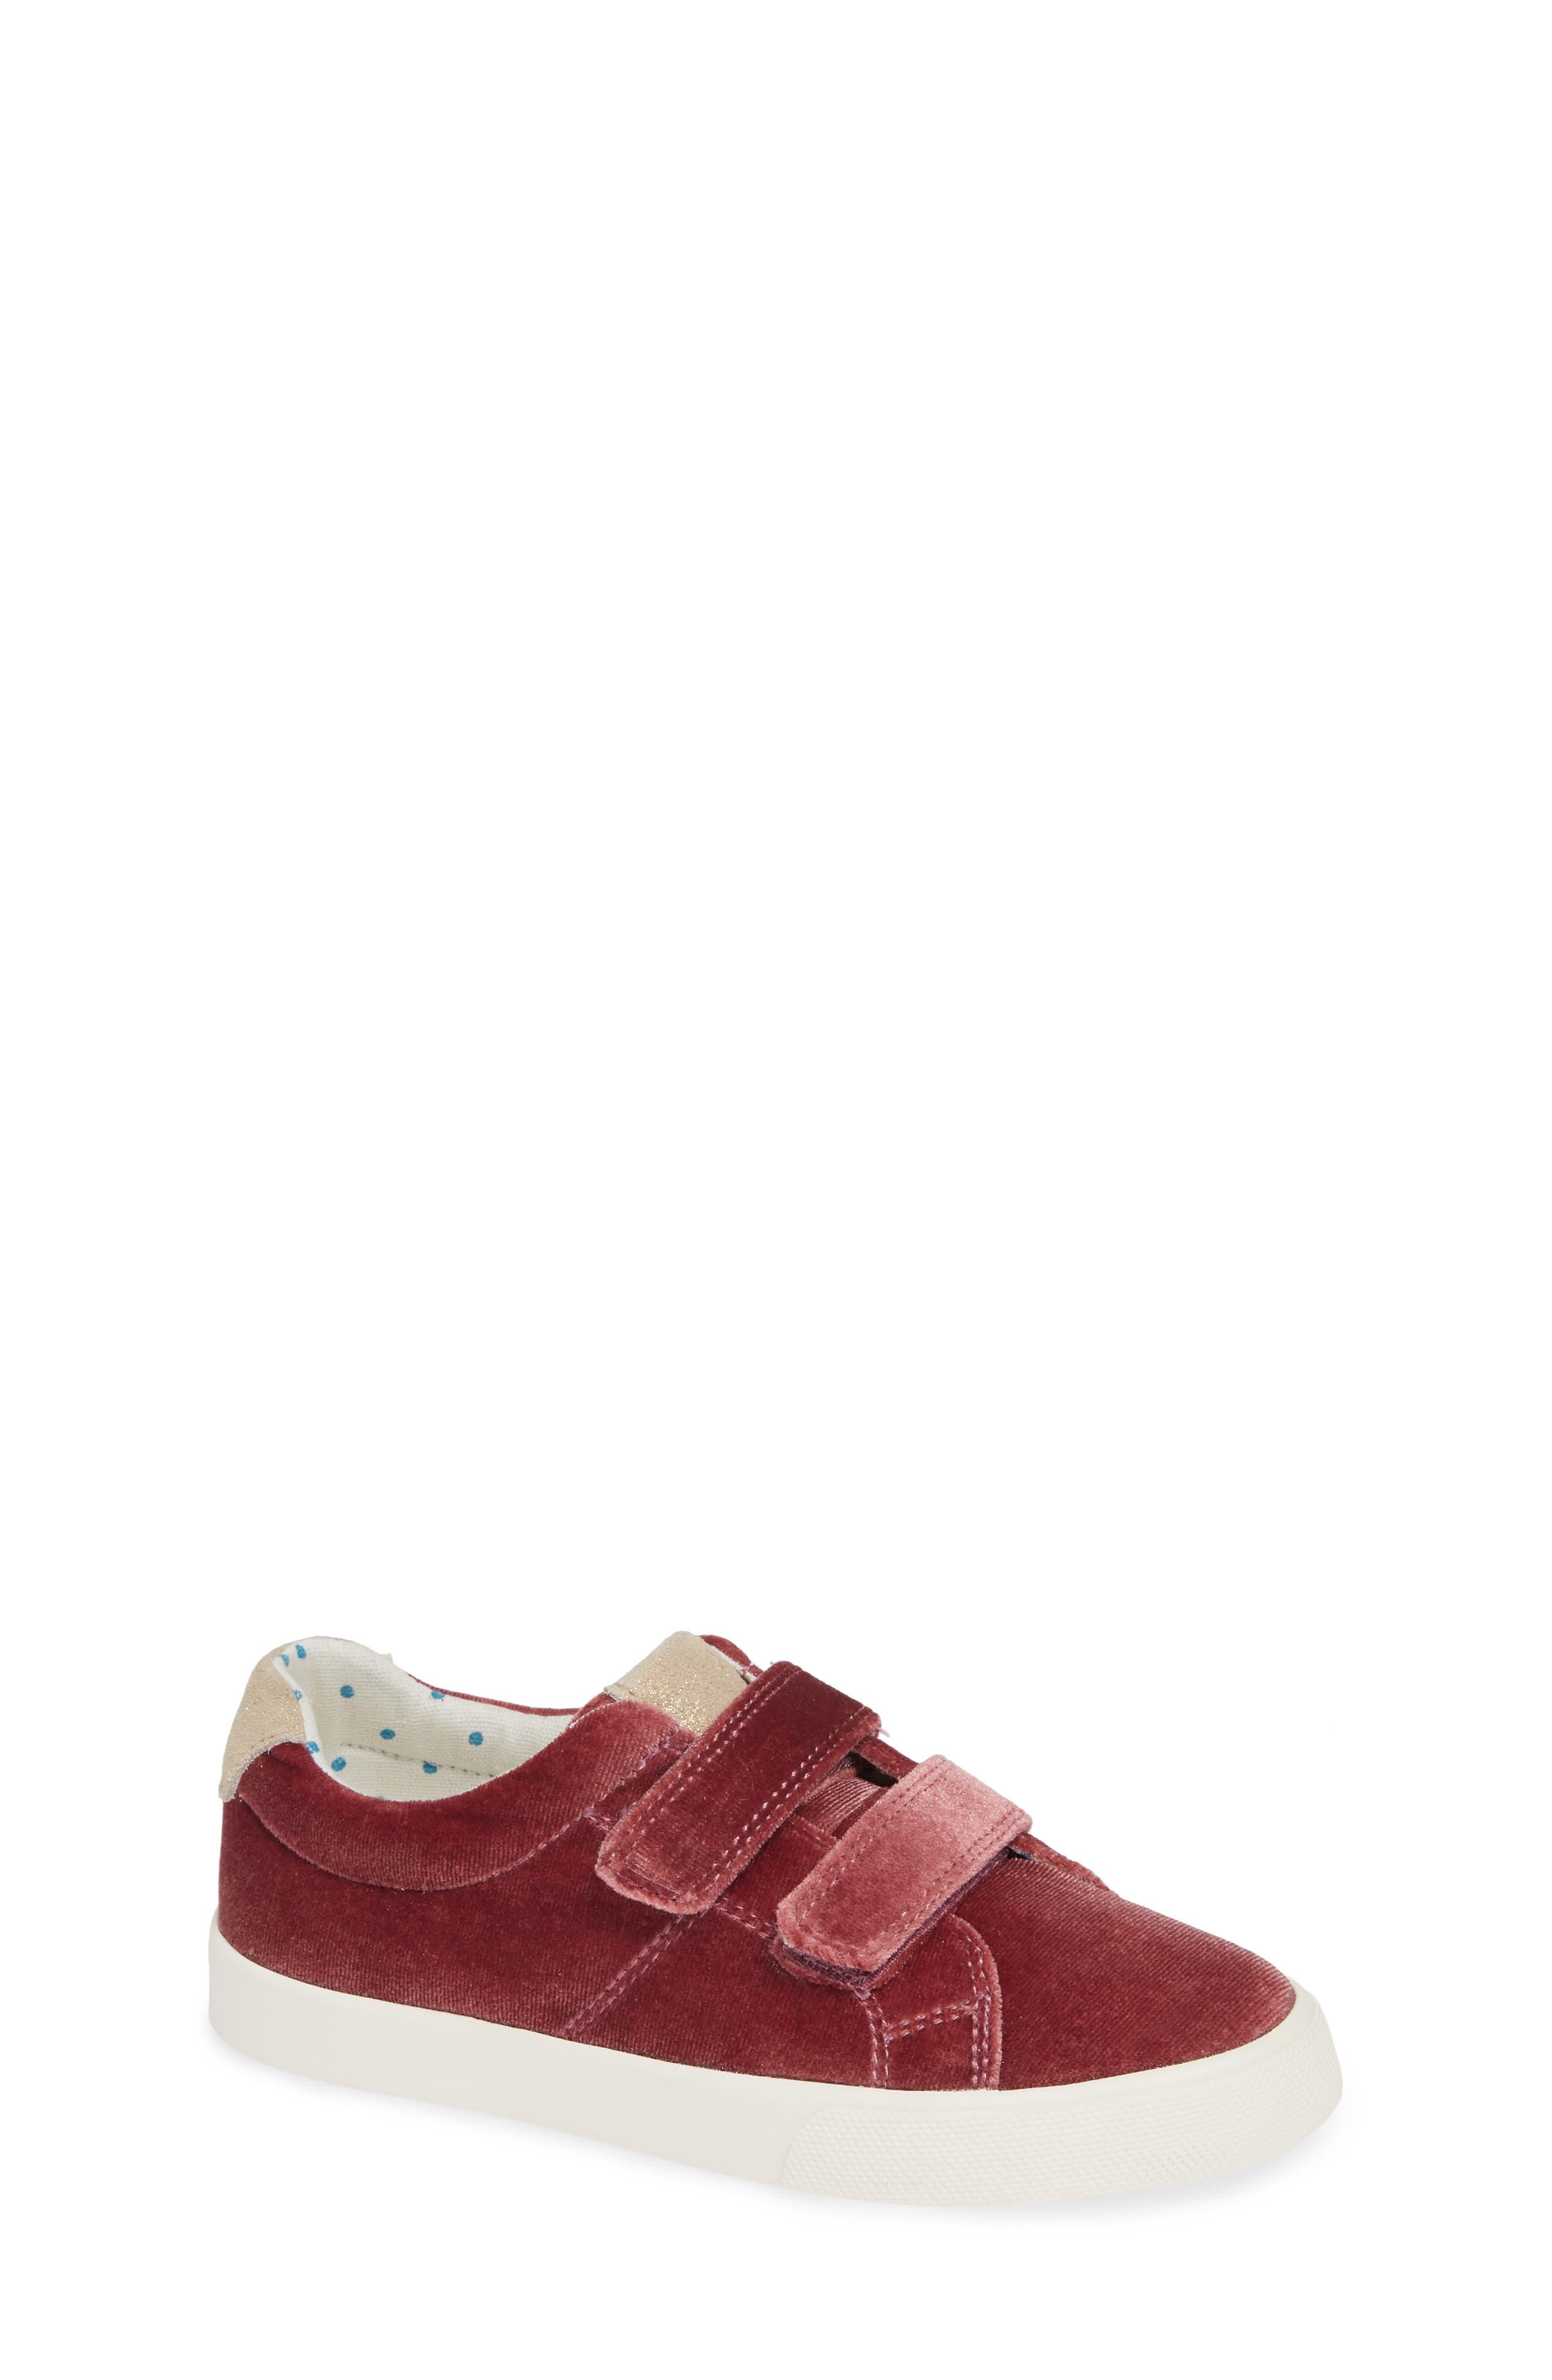 Mini Boden Fun Low Top Sneaker,                             Main thumbnail 1, color,                             Deep Berry